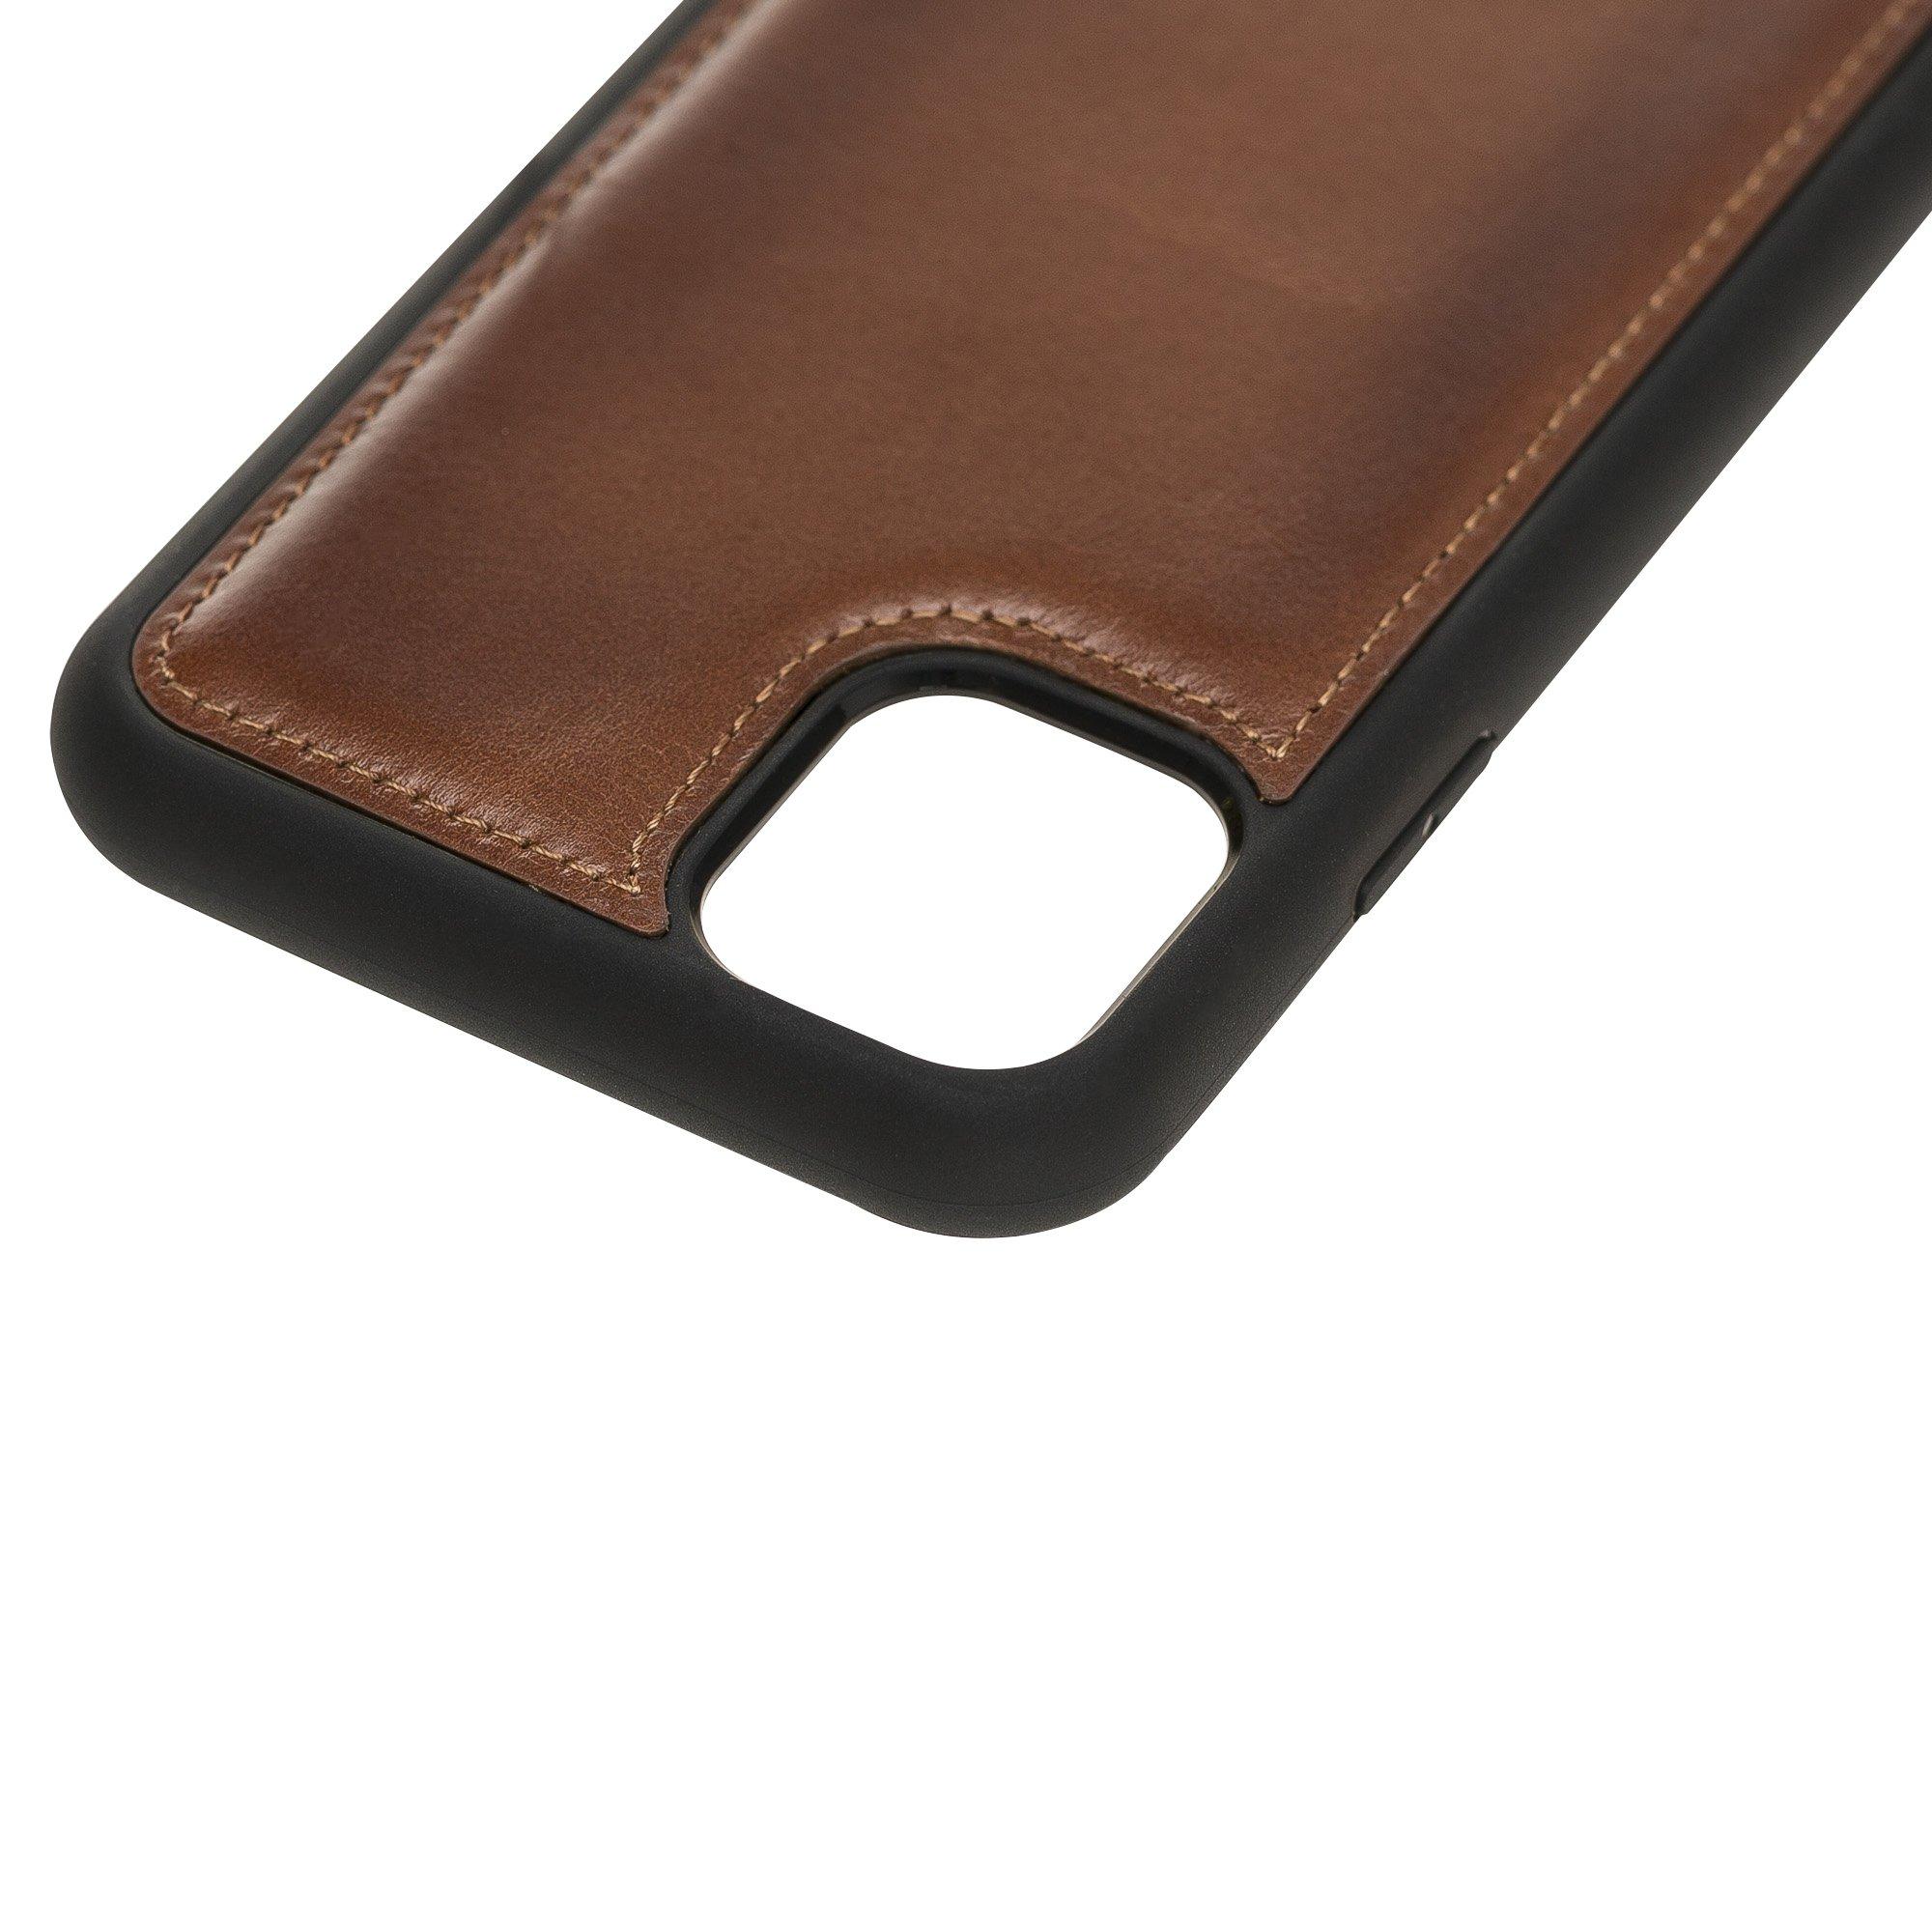 Solo Pelle Lederhülle für das iPhone 11 (XI) 6.1 Zoll Stanford Case Leder Hülle Ledertasche Backcover aus echtem Leder (Cognac Braun Burned)